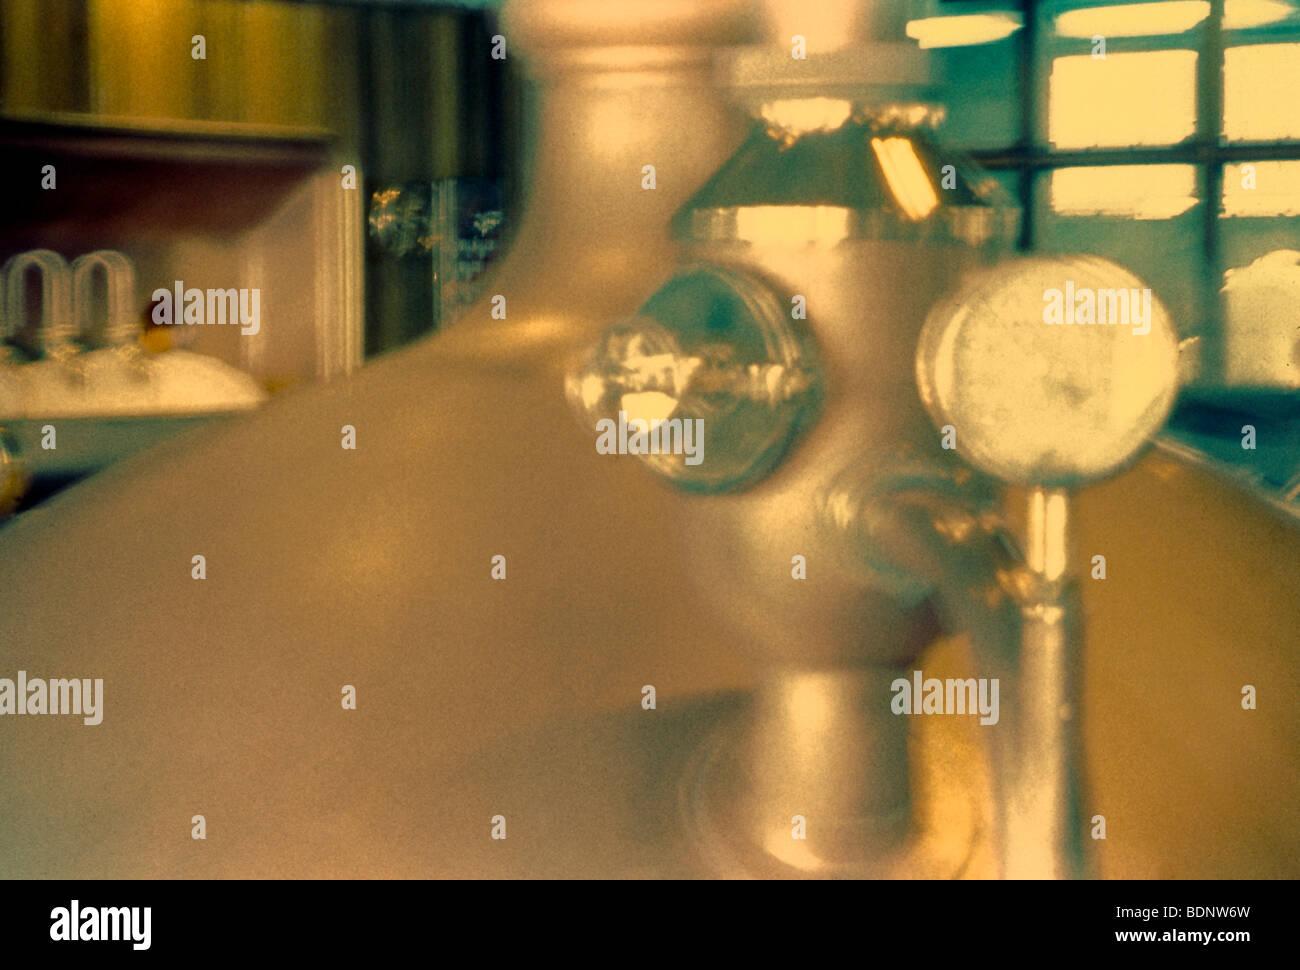 Food manufacturing, brewery tanks. San Francisco Stock Photo